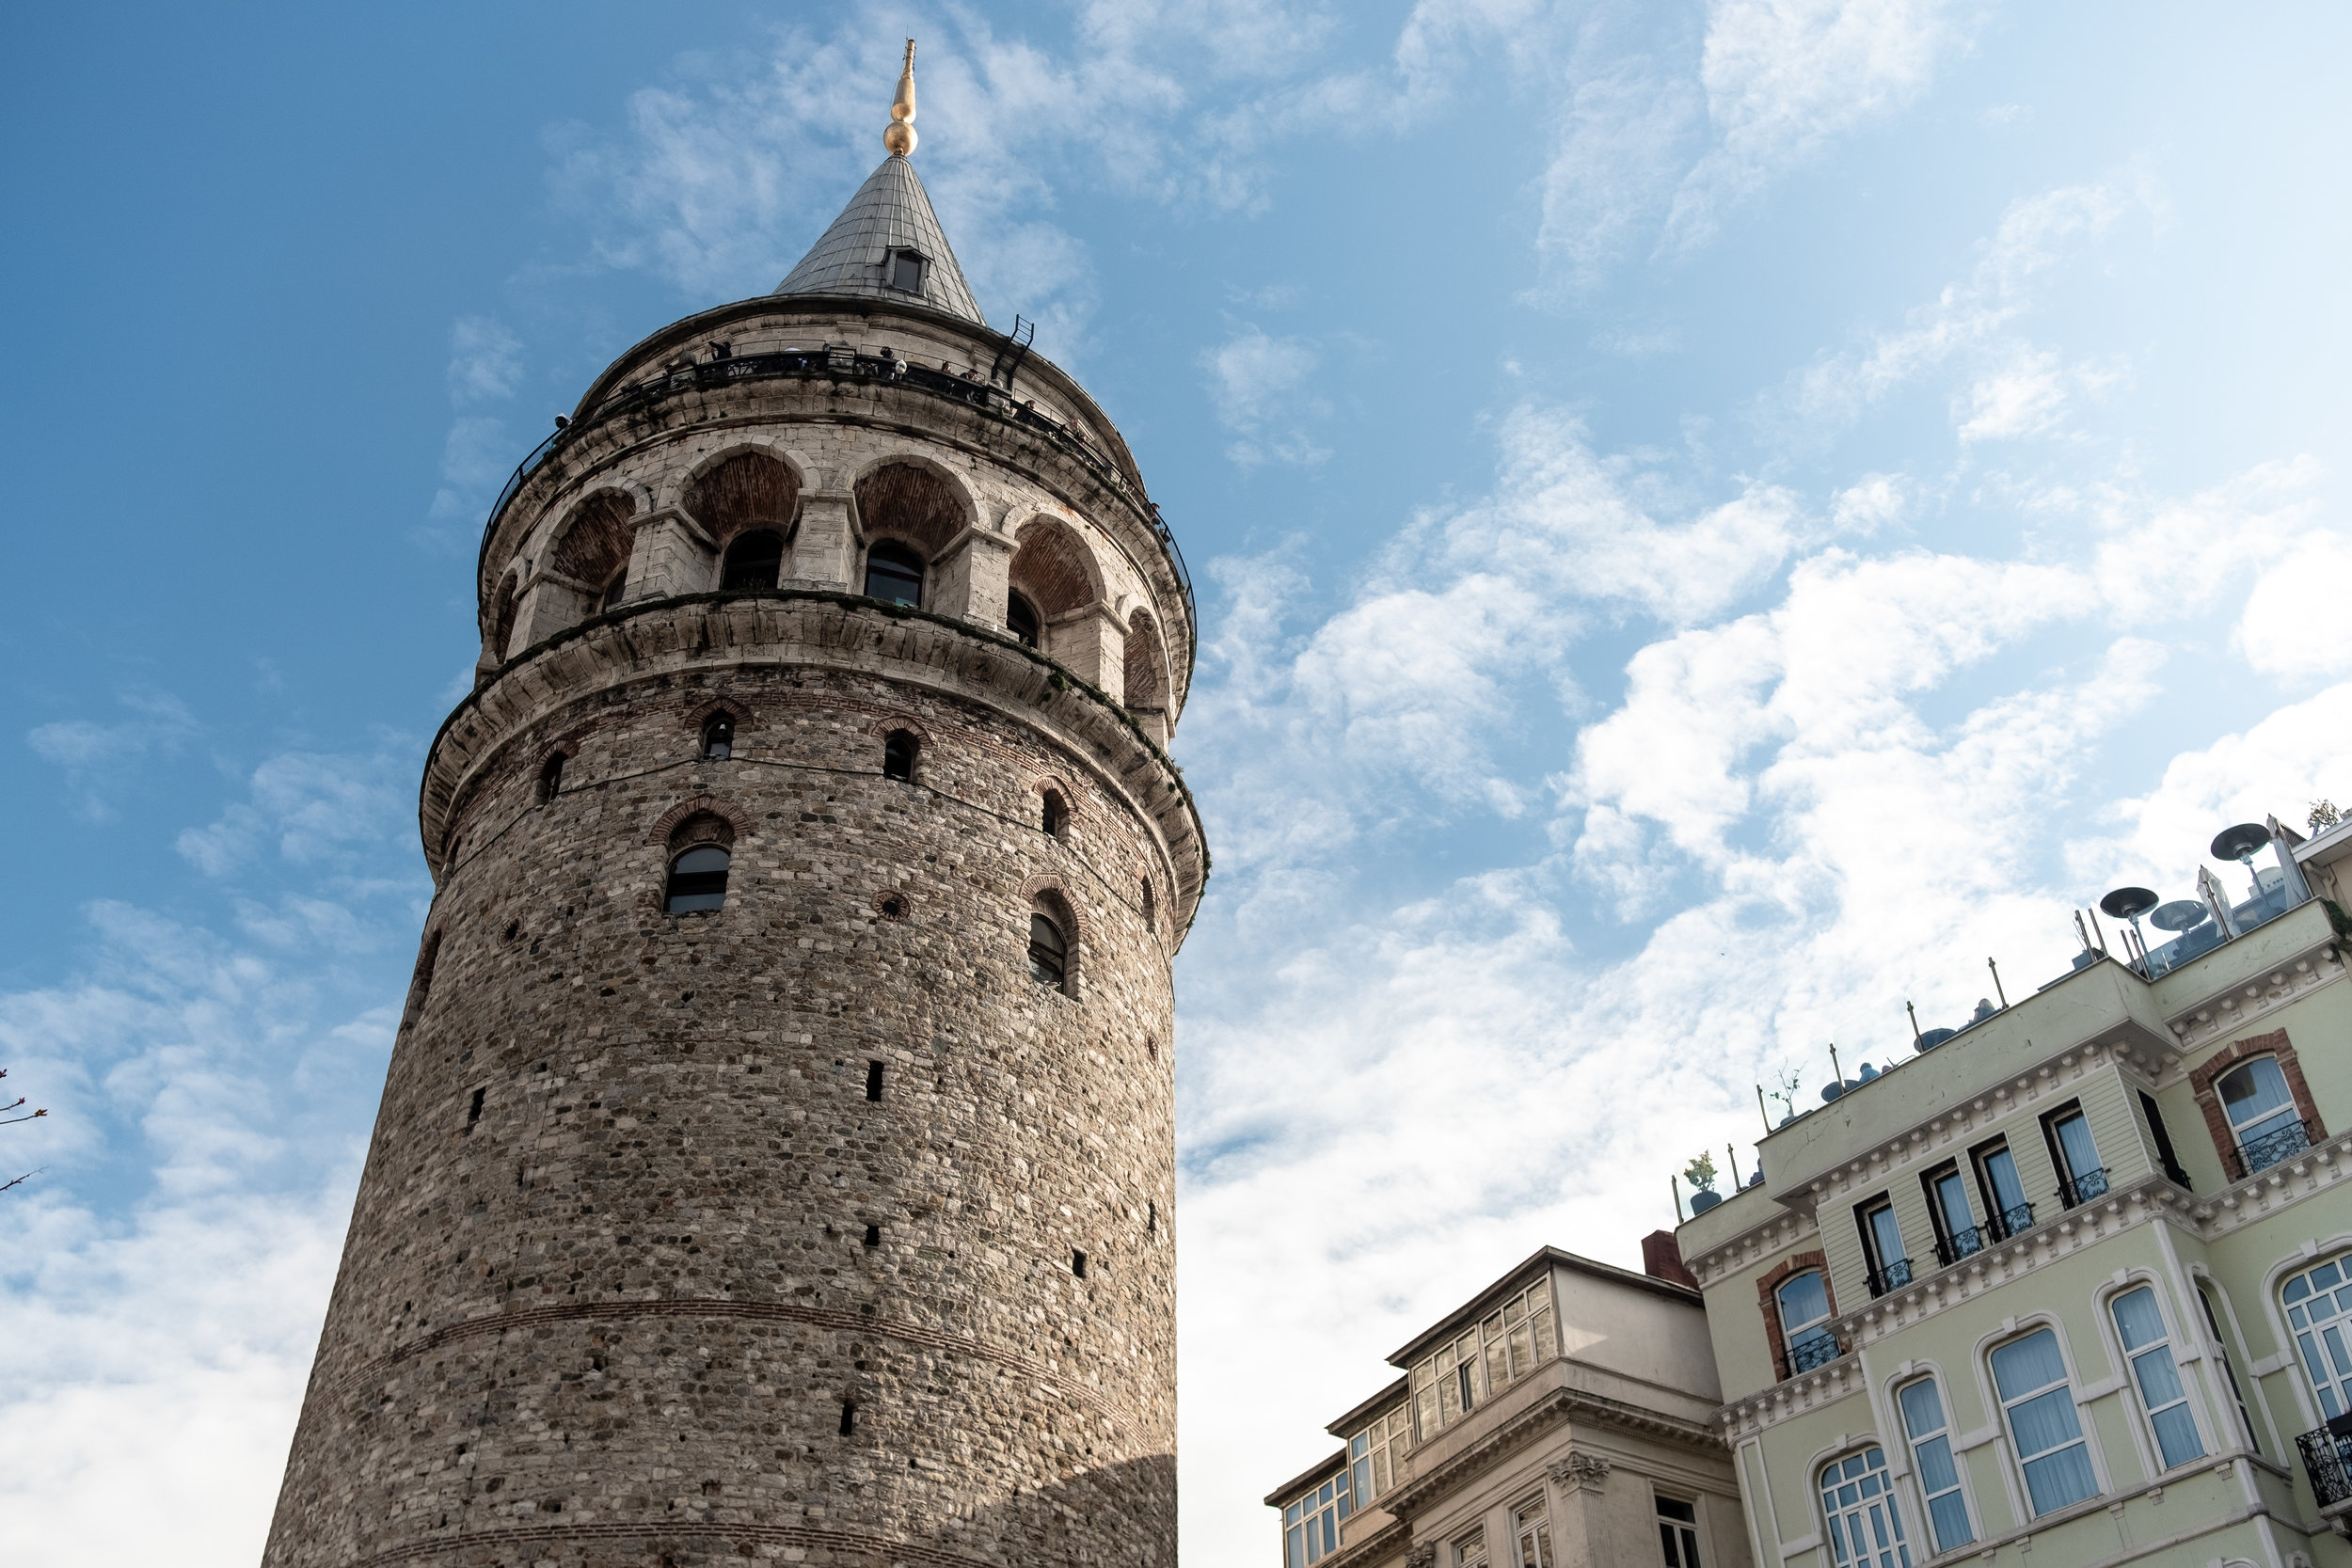 20190407 - Turkey - 0987.JPG